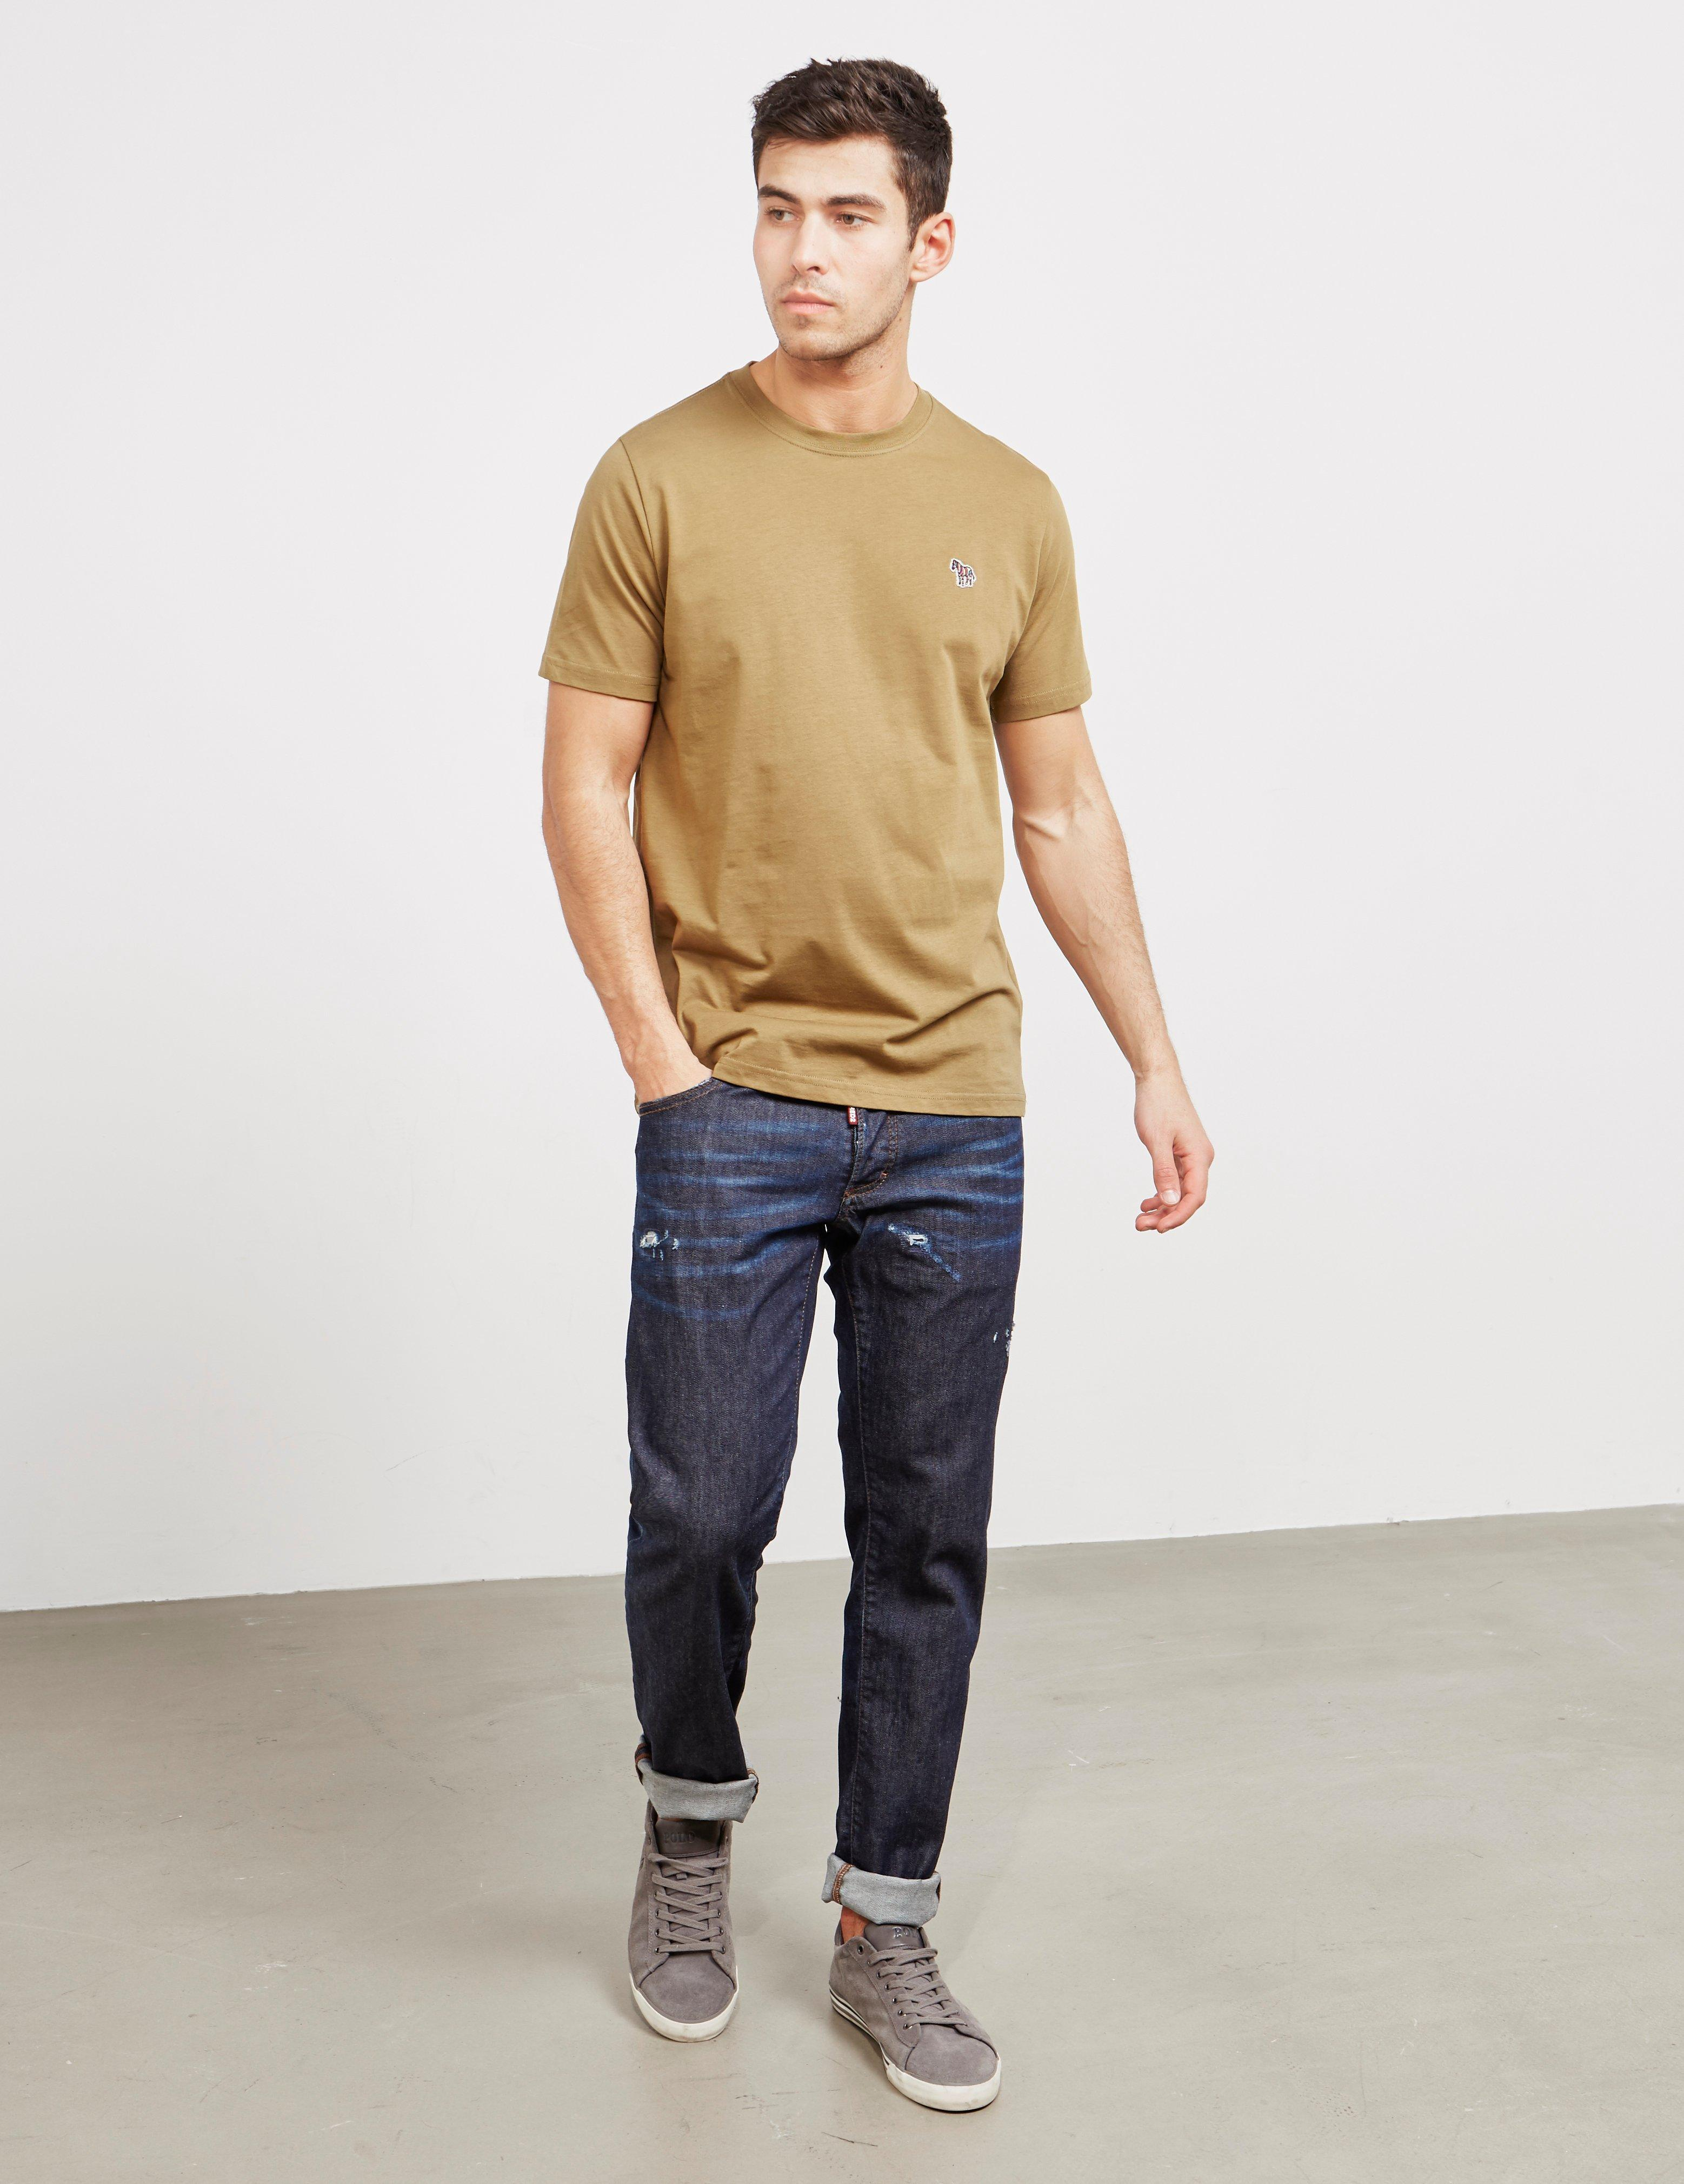 8693e40e6 PS by Paul Smith Basic Zebra Short Sleeve T-shirt Green in Green for Men -  Lyst